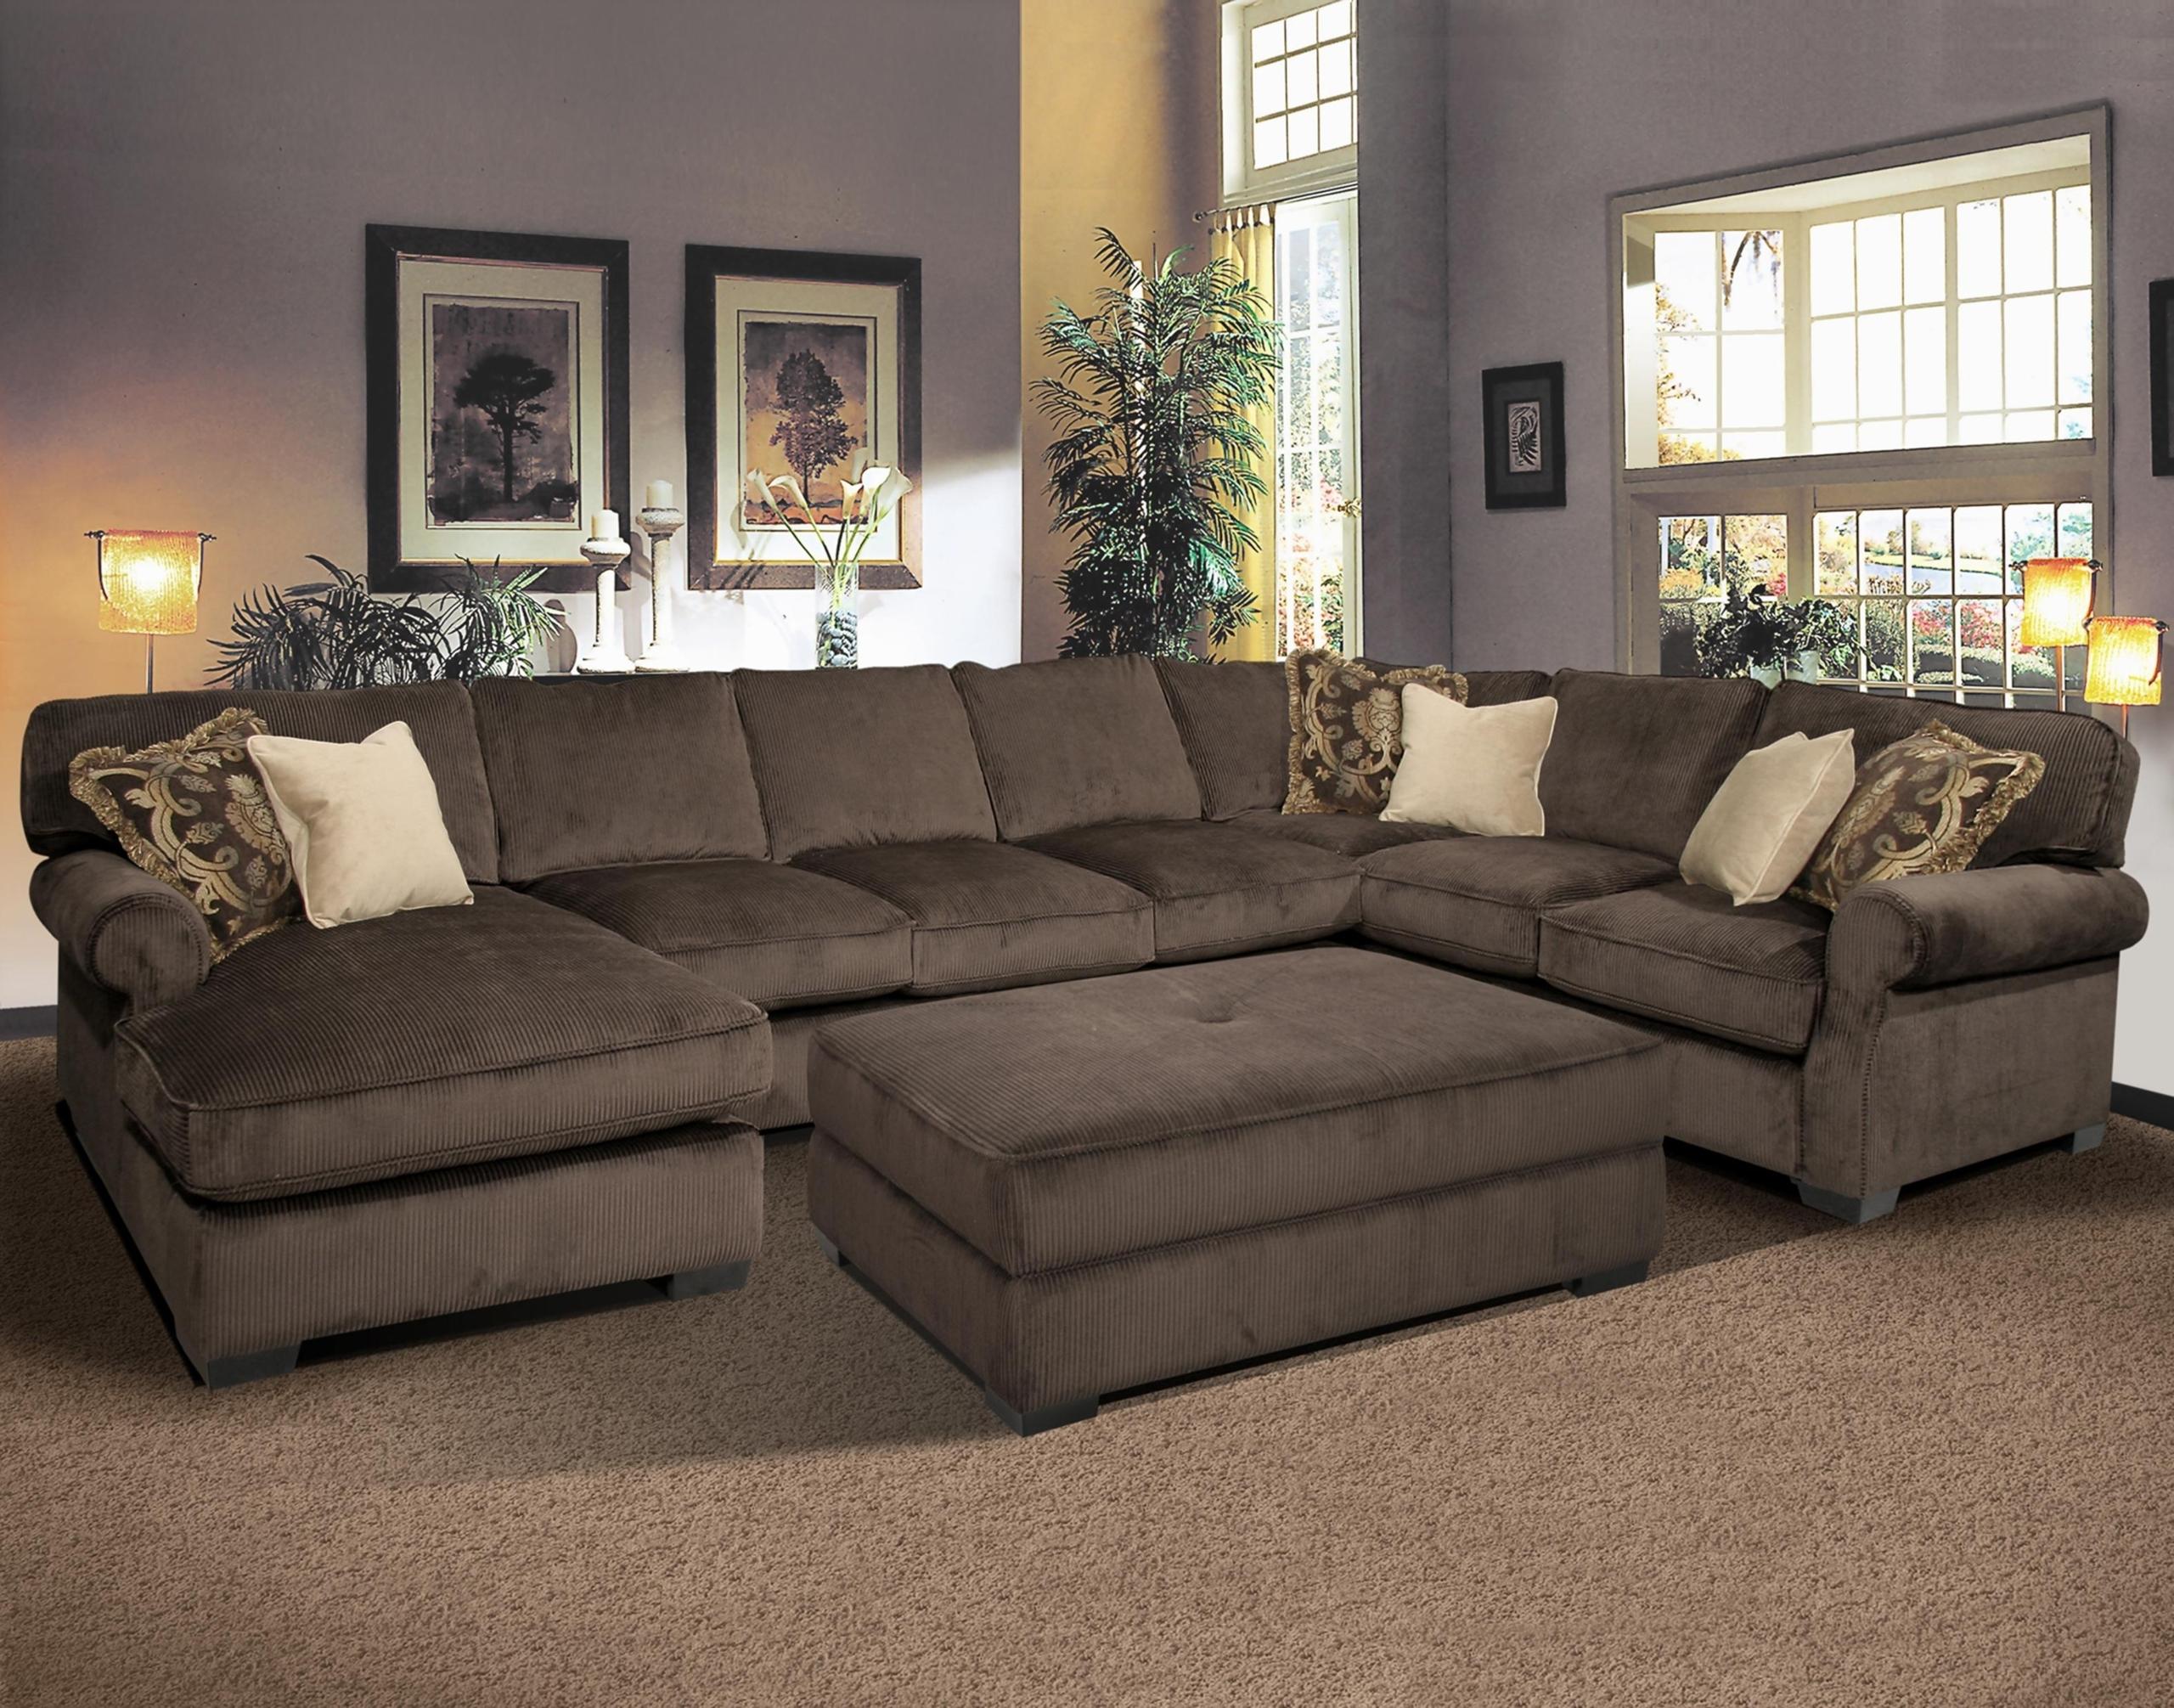 Genial Extra Large Sectional Sofa U2013 TheSofa